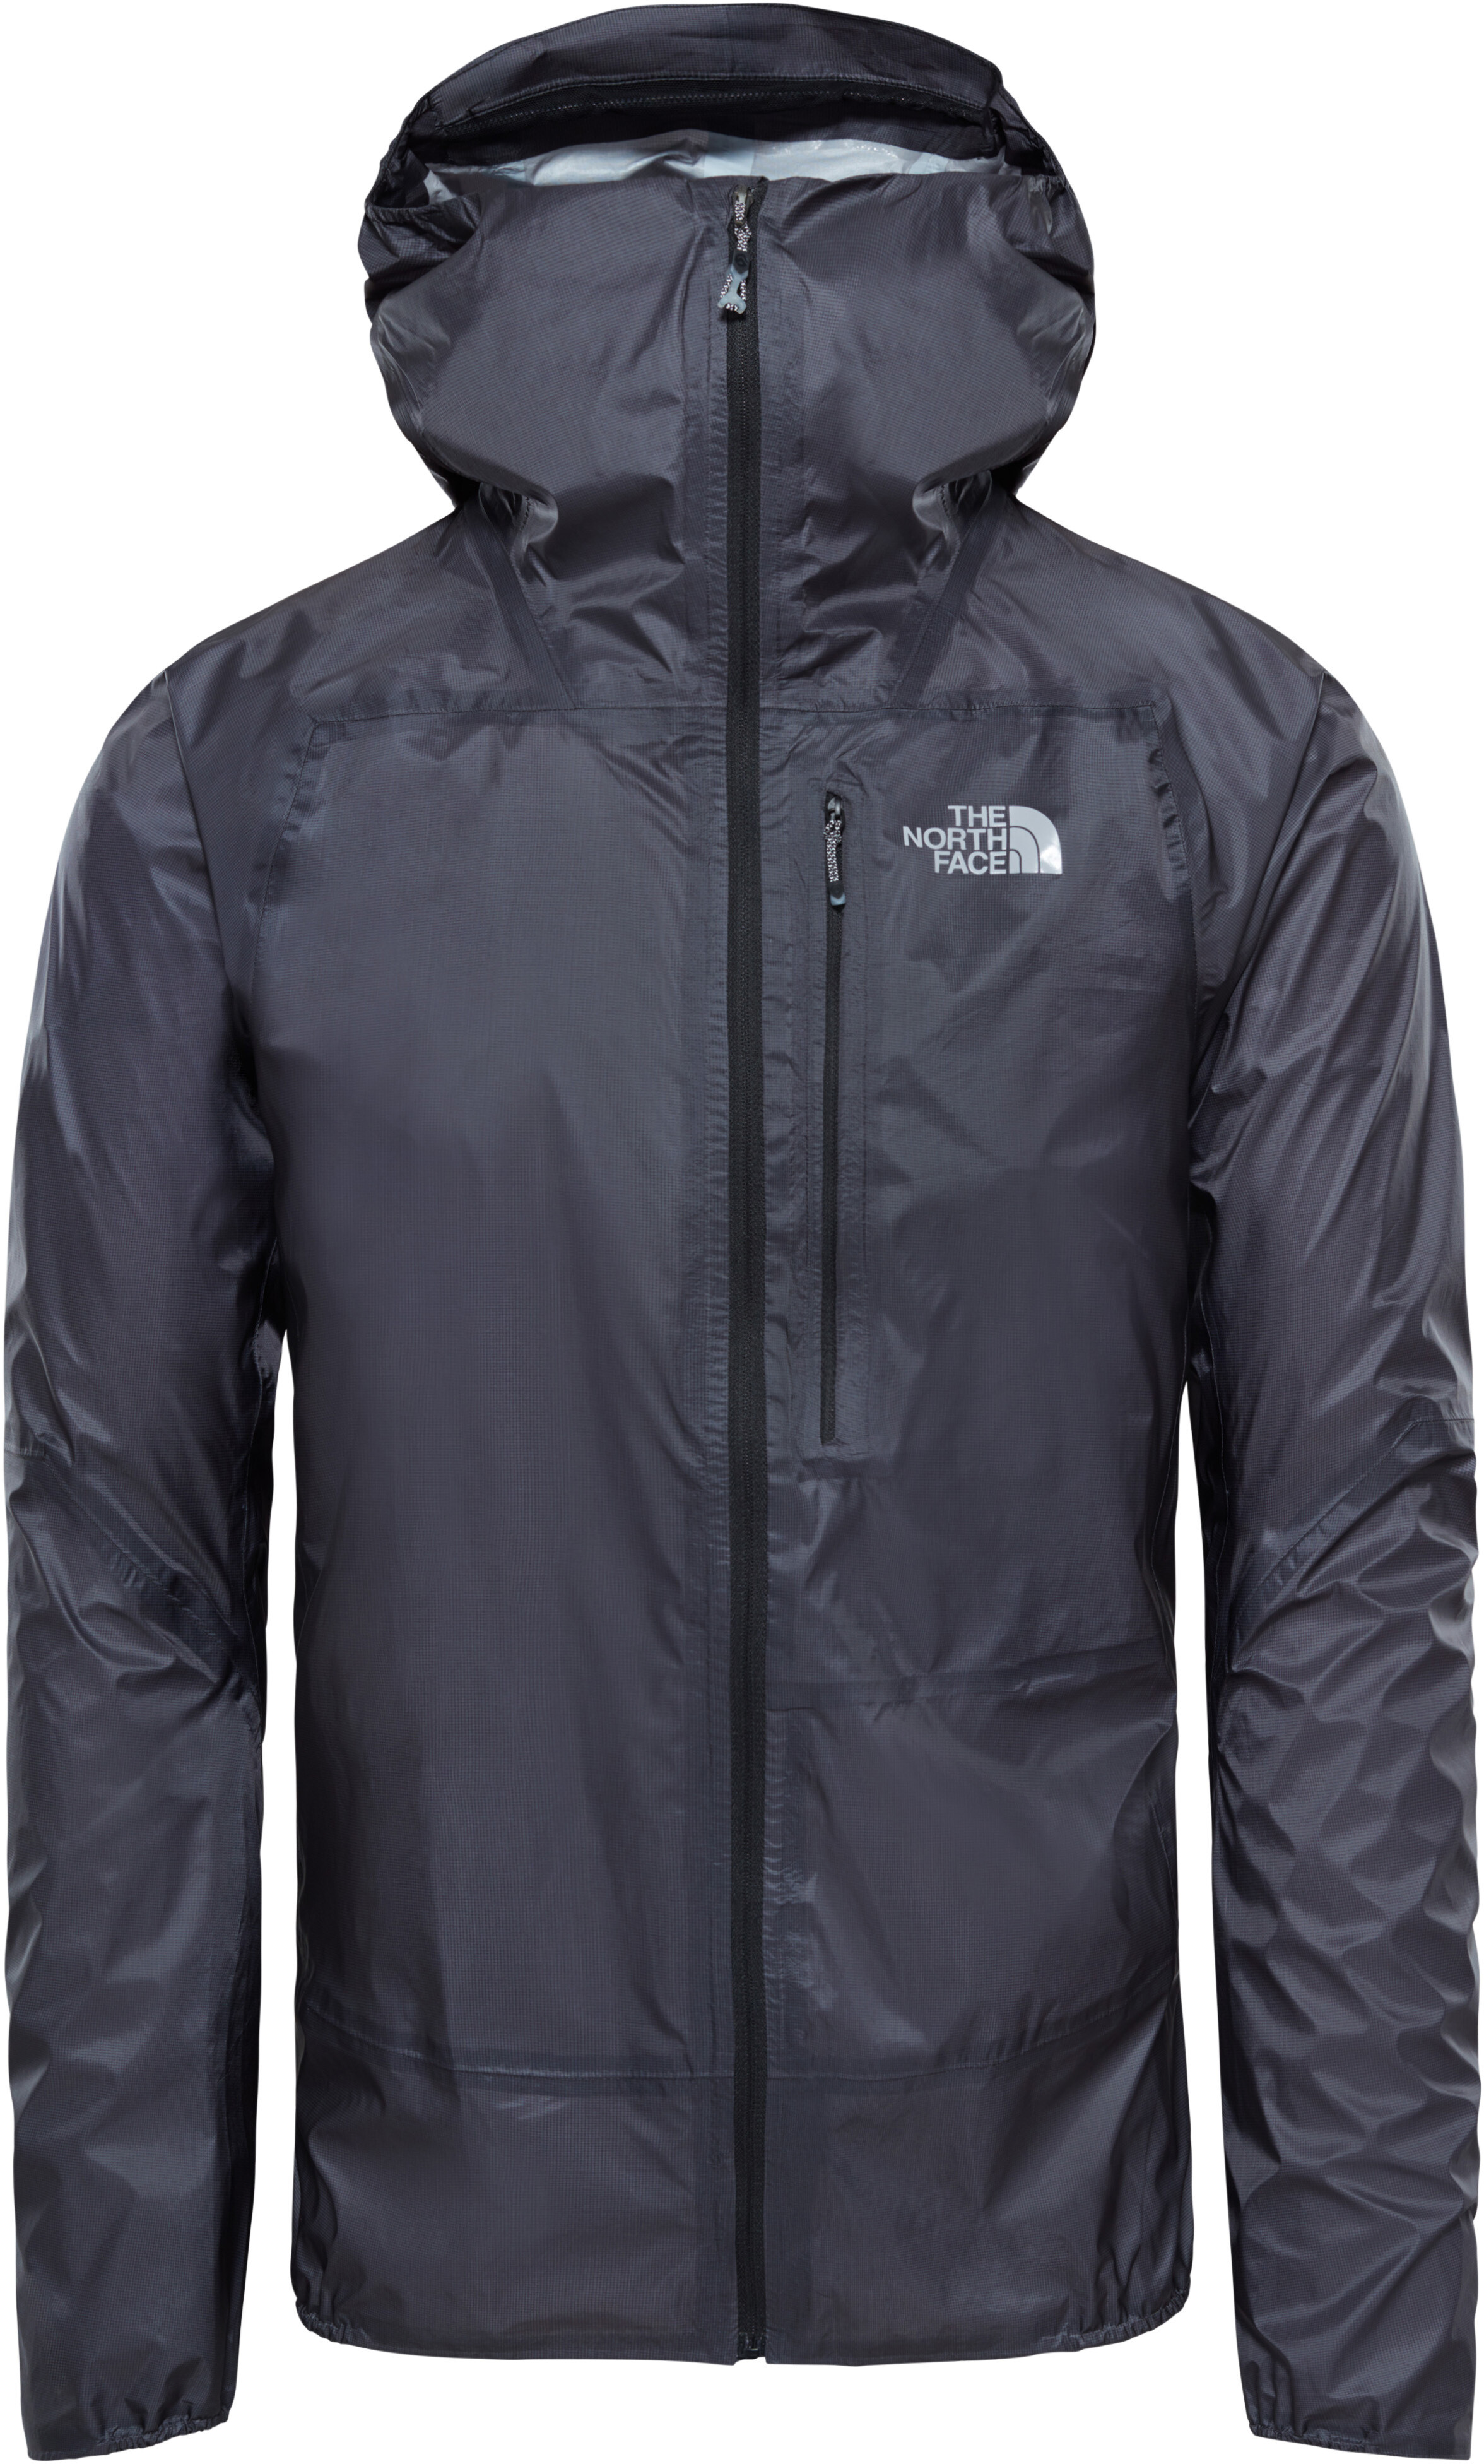 961c34132 The North Face Summit L5 Ultralight Storm Jacket Herr tnf black/tnf black